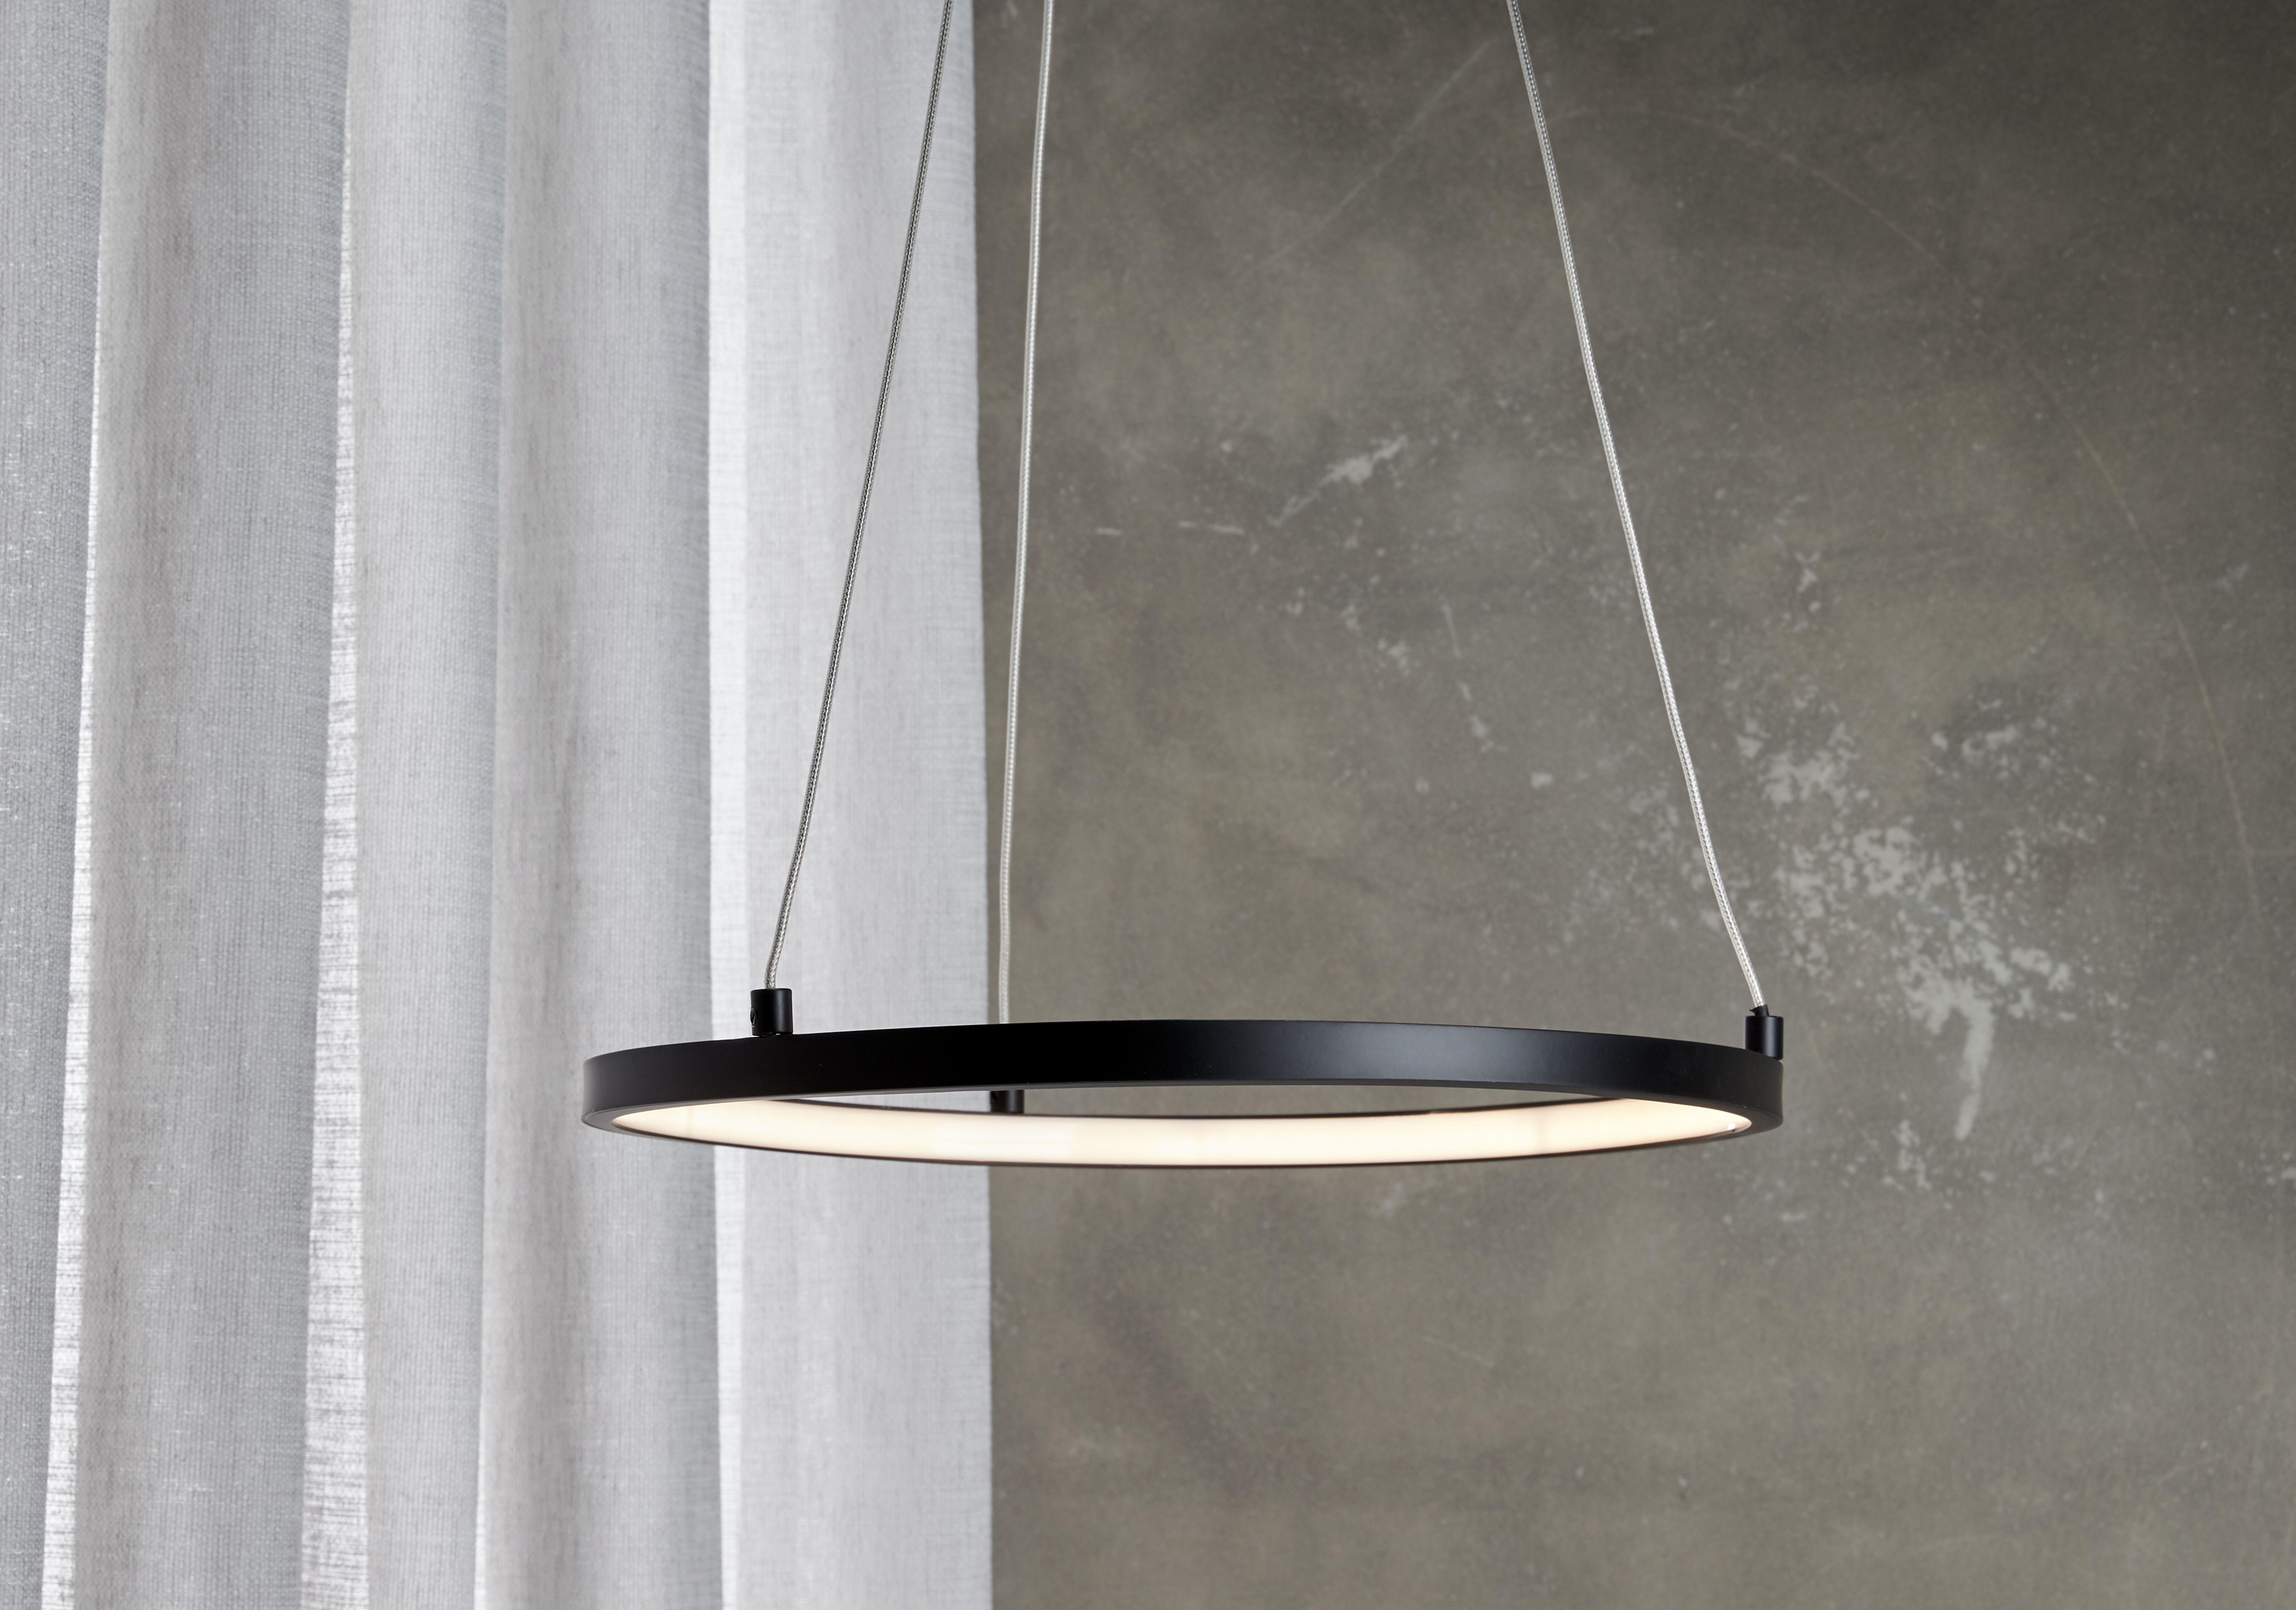 Staande Lampen Industrieel : Staande lamp industrieel zwart staande lamp industrieel hout